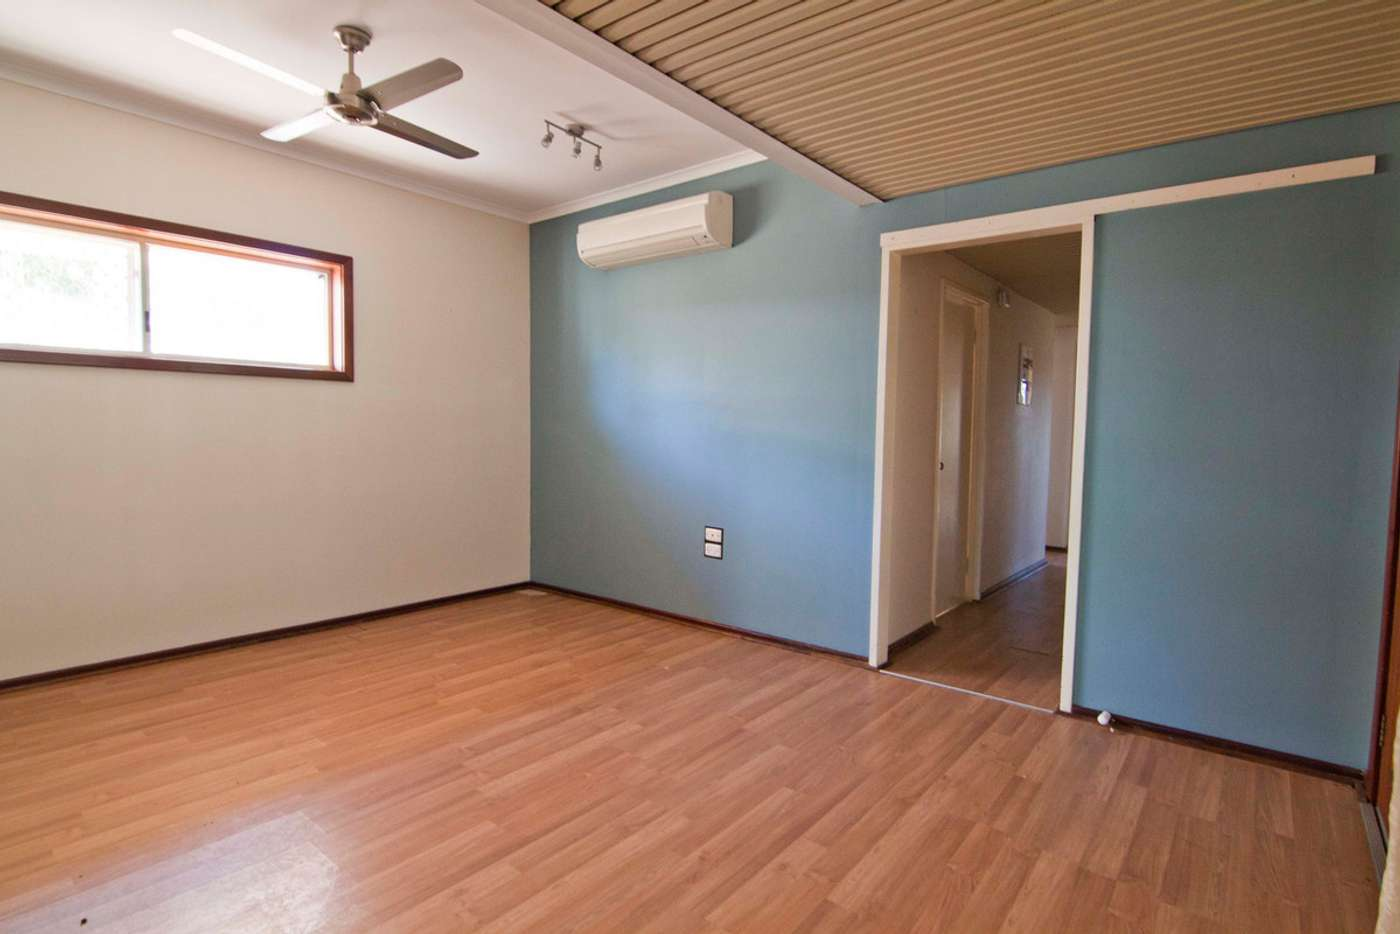 Sixth view of Homely house listing, 33 Eucalyptus Close, Kununurra WA 6743